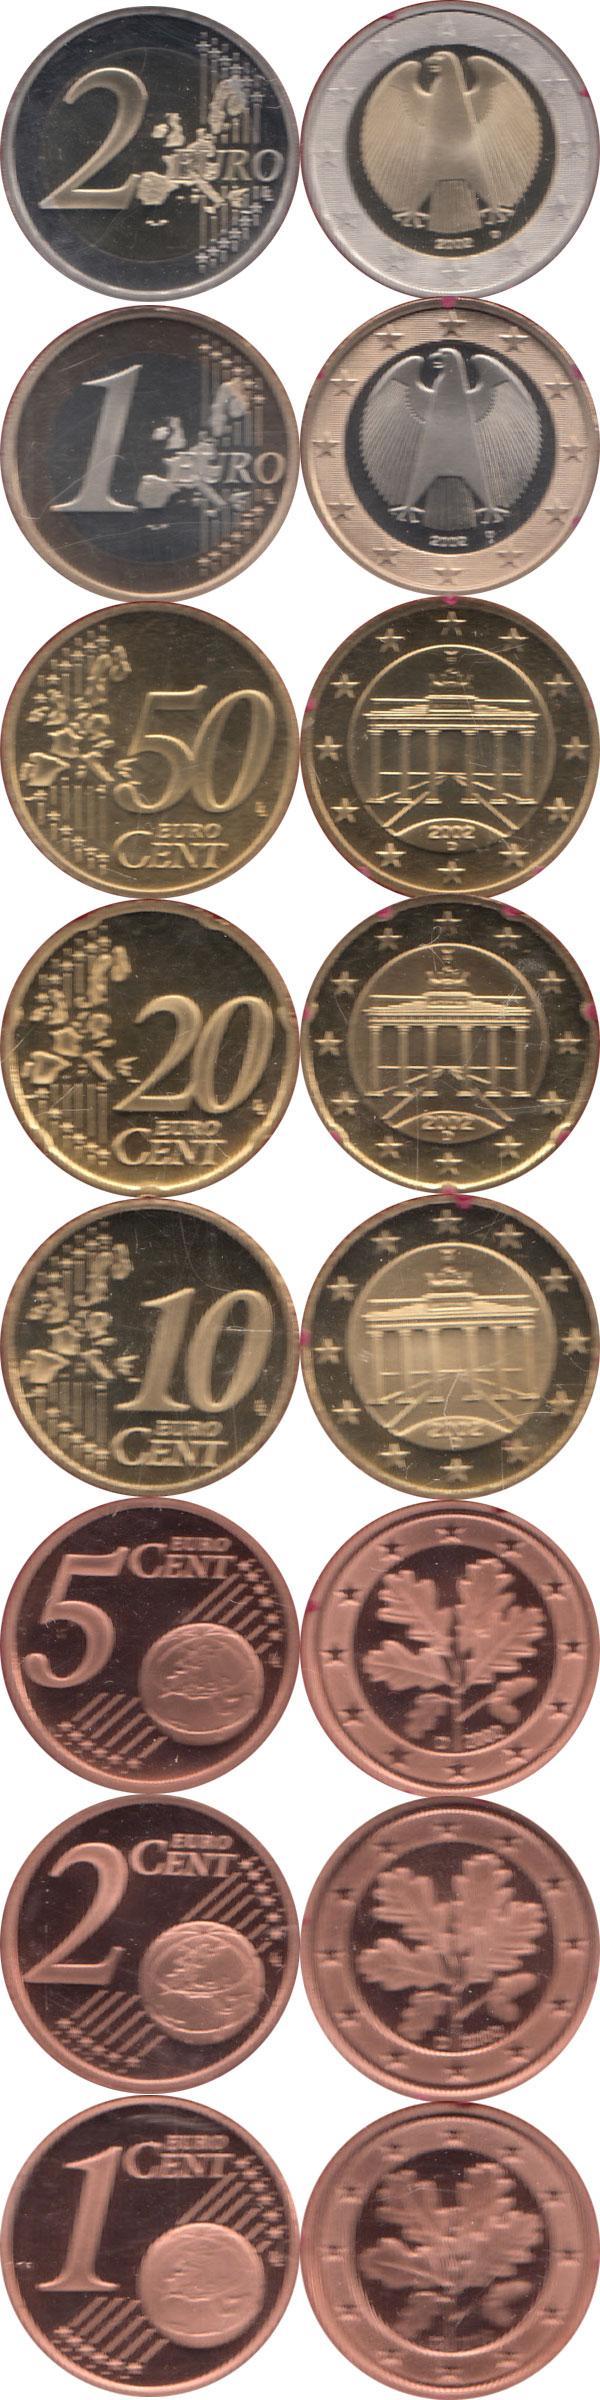 Каталог монет - Германия Евронабор 2002, Чеканка Мюнхен